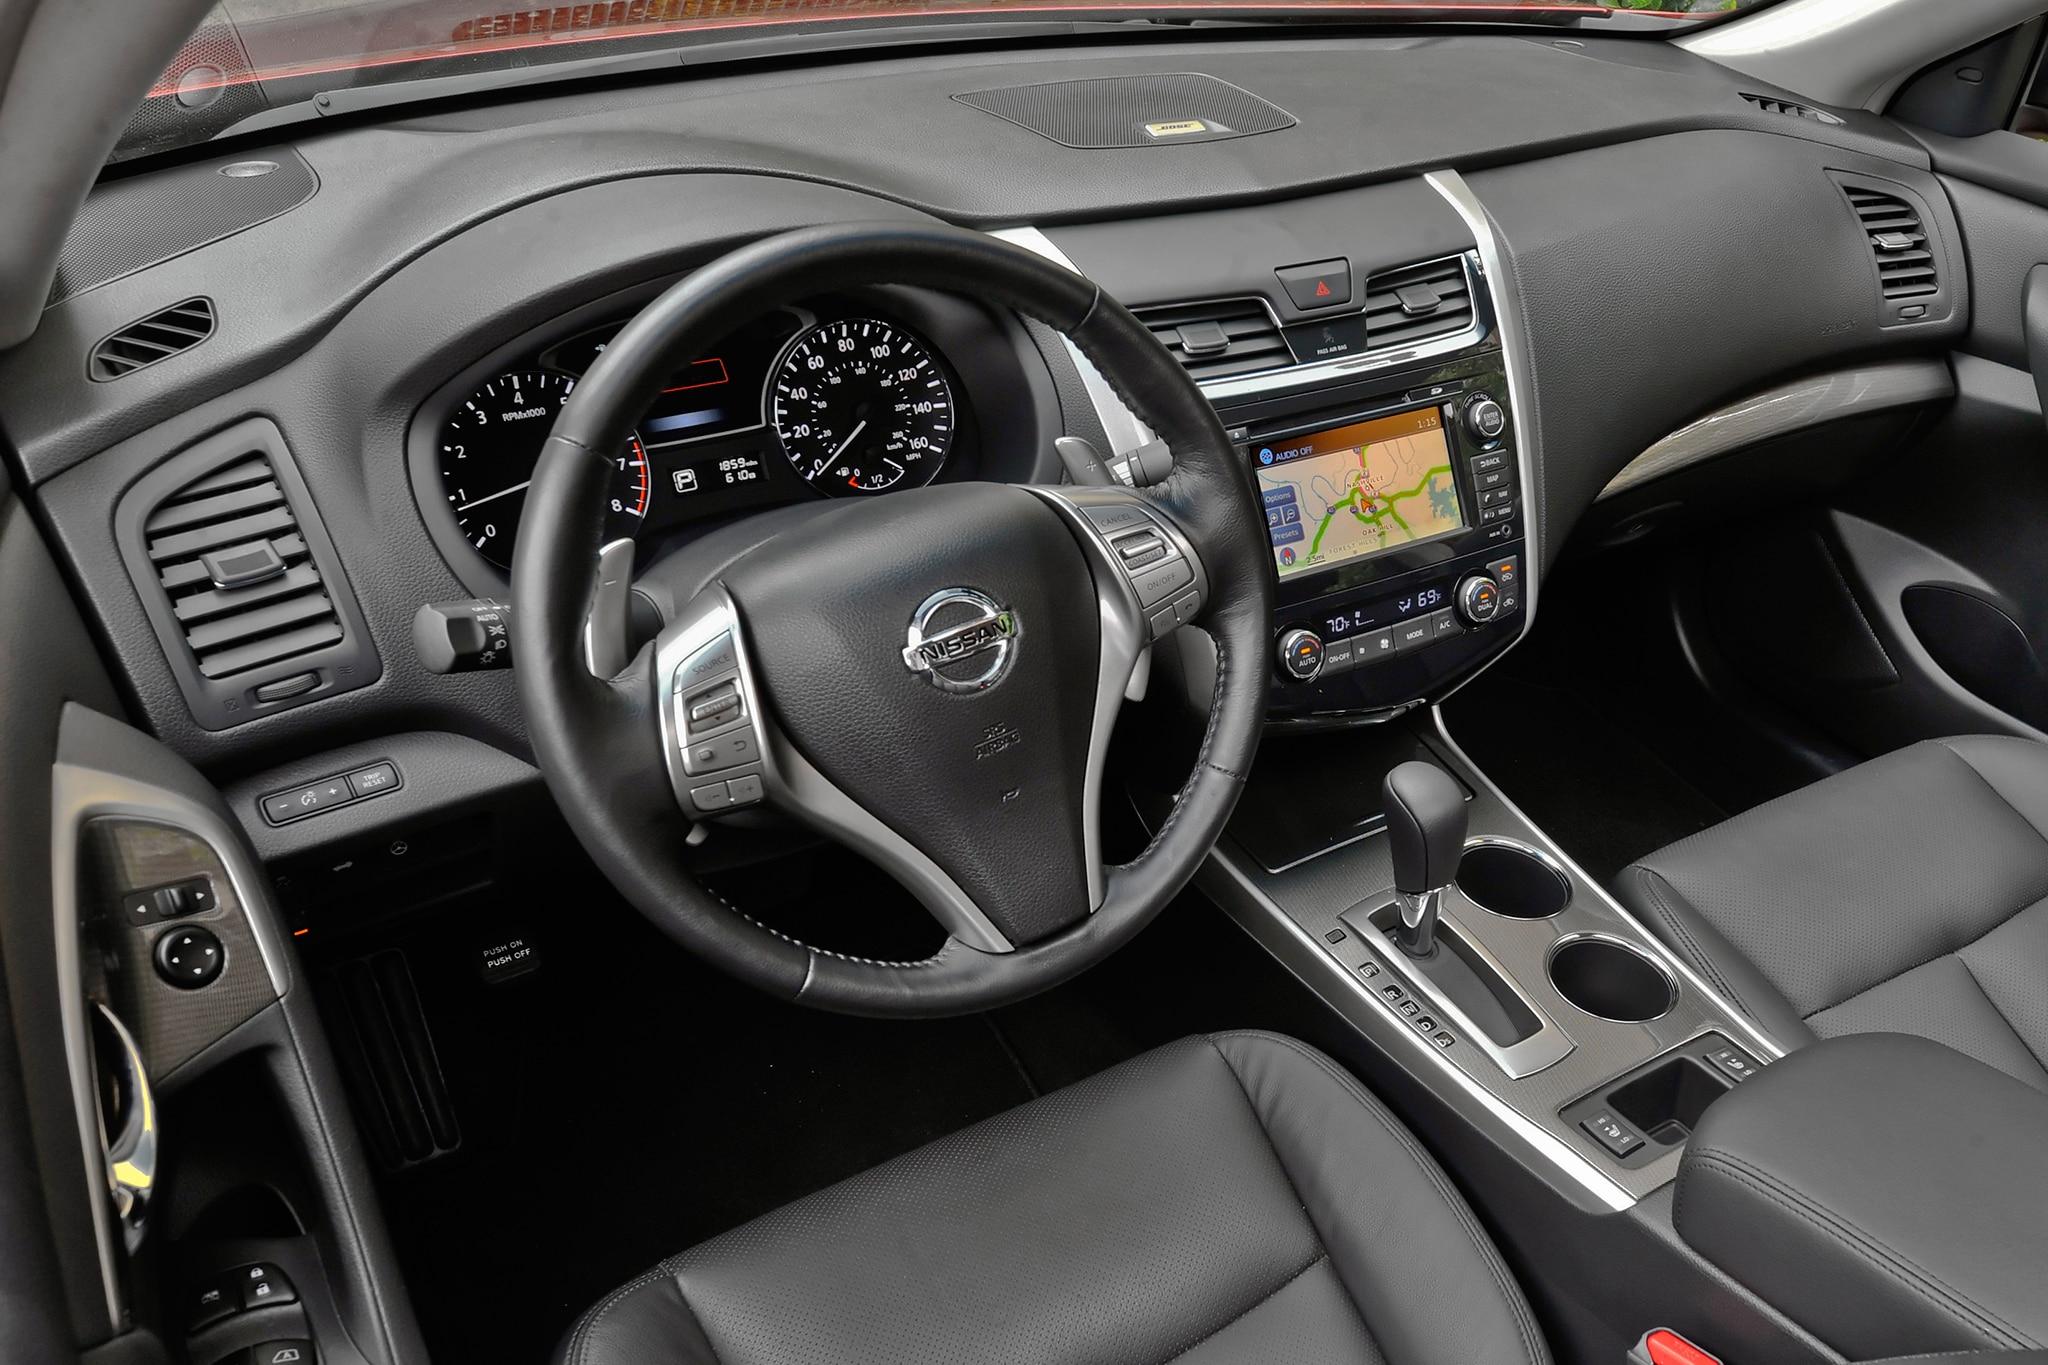 First Drive: 2013 Nissan Altima - Automobile Magazine